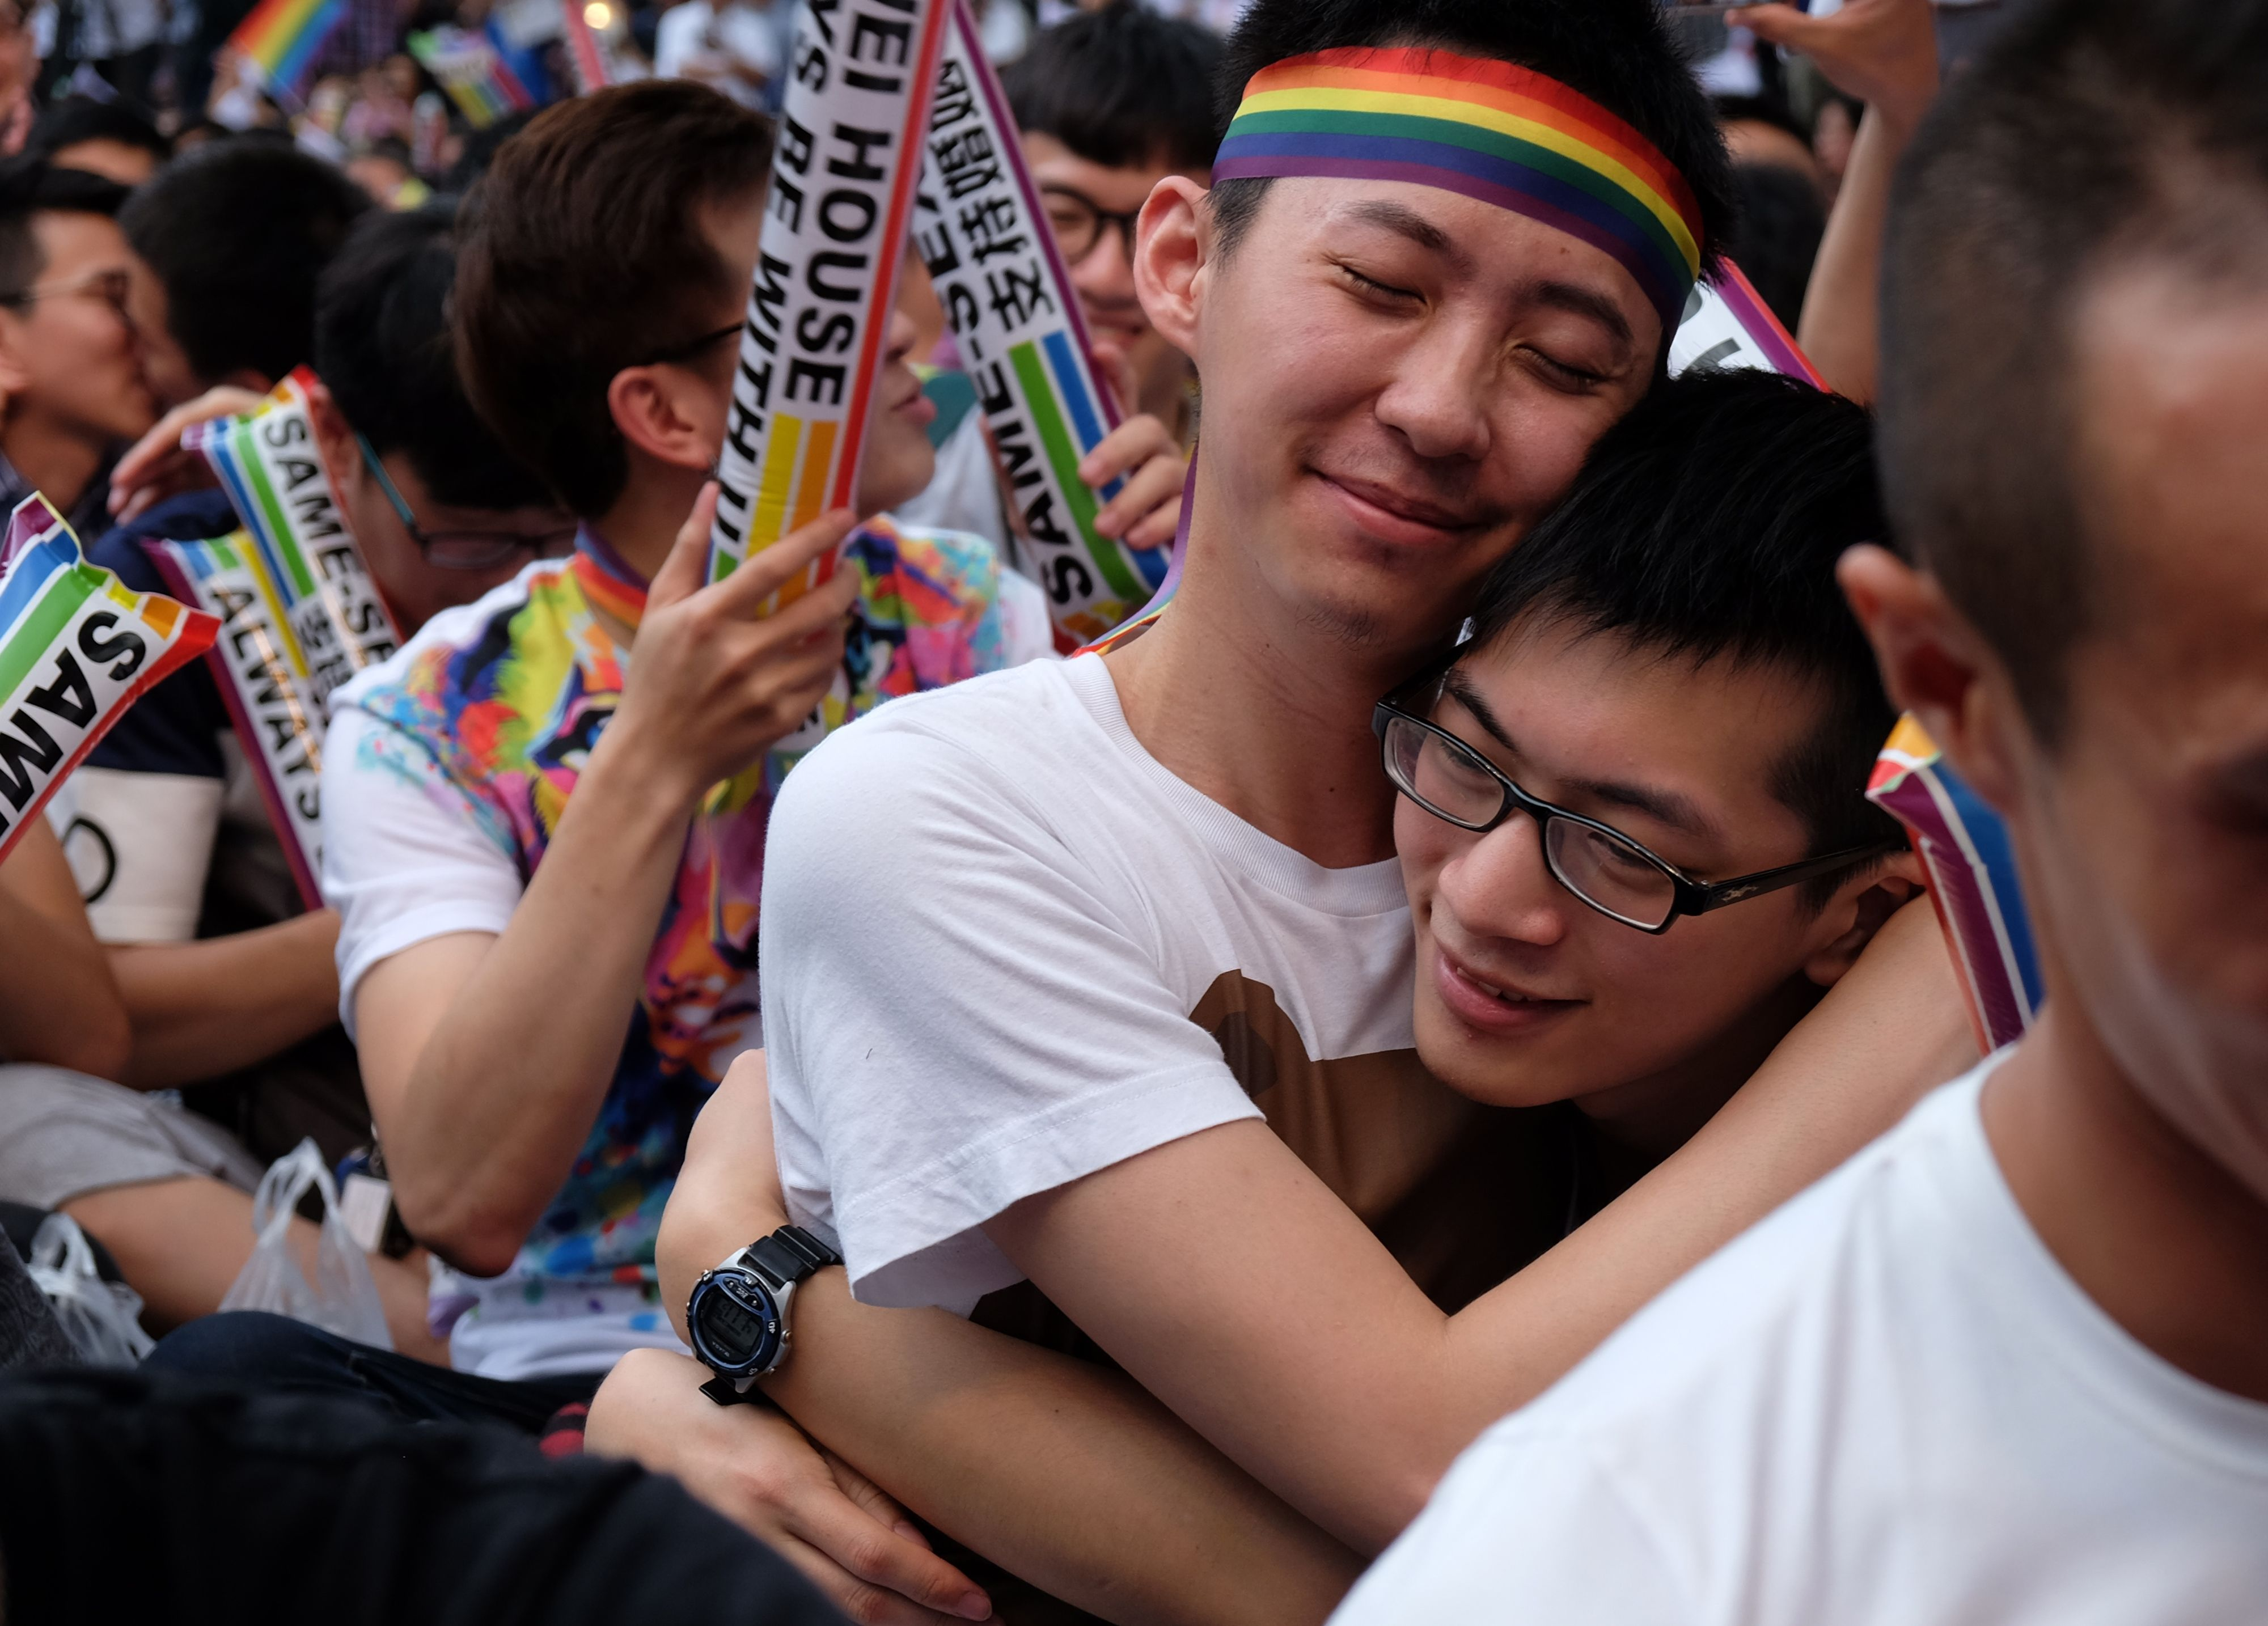 Taiwan torna-se o primeiro país asiático a legalizar o casamento homossexual